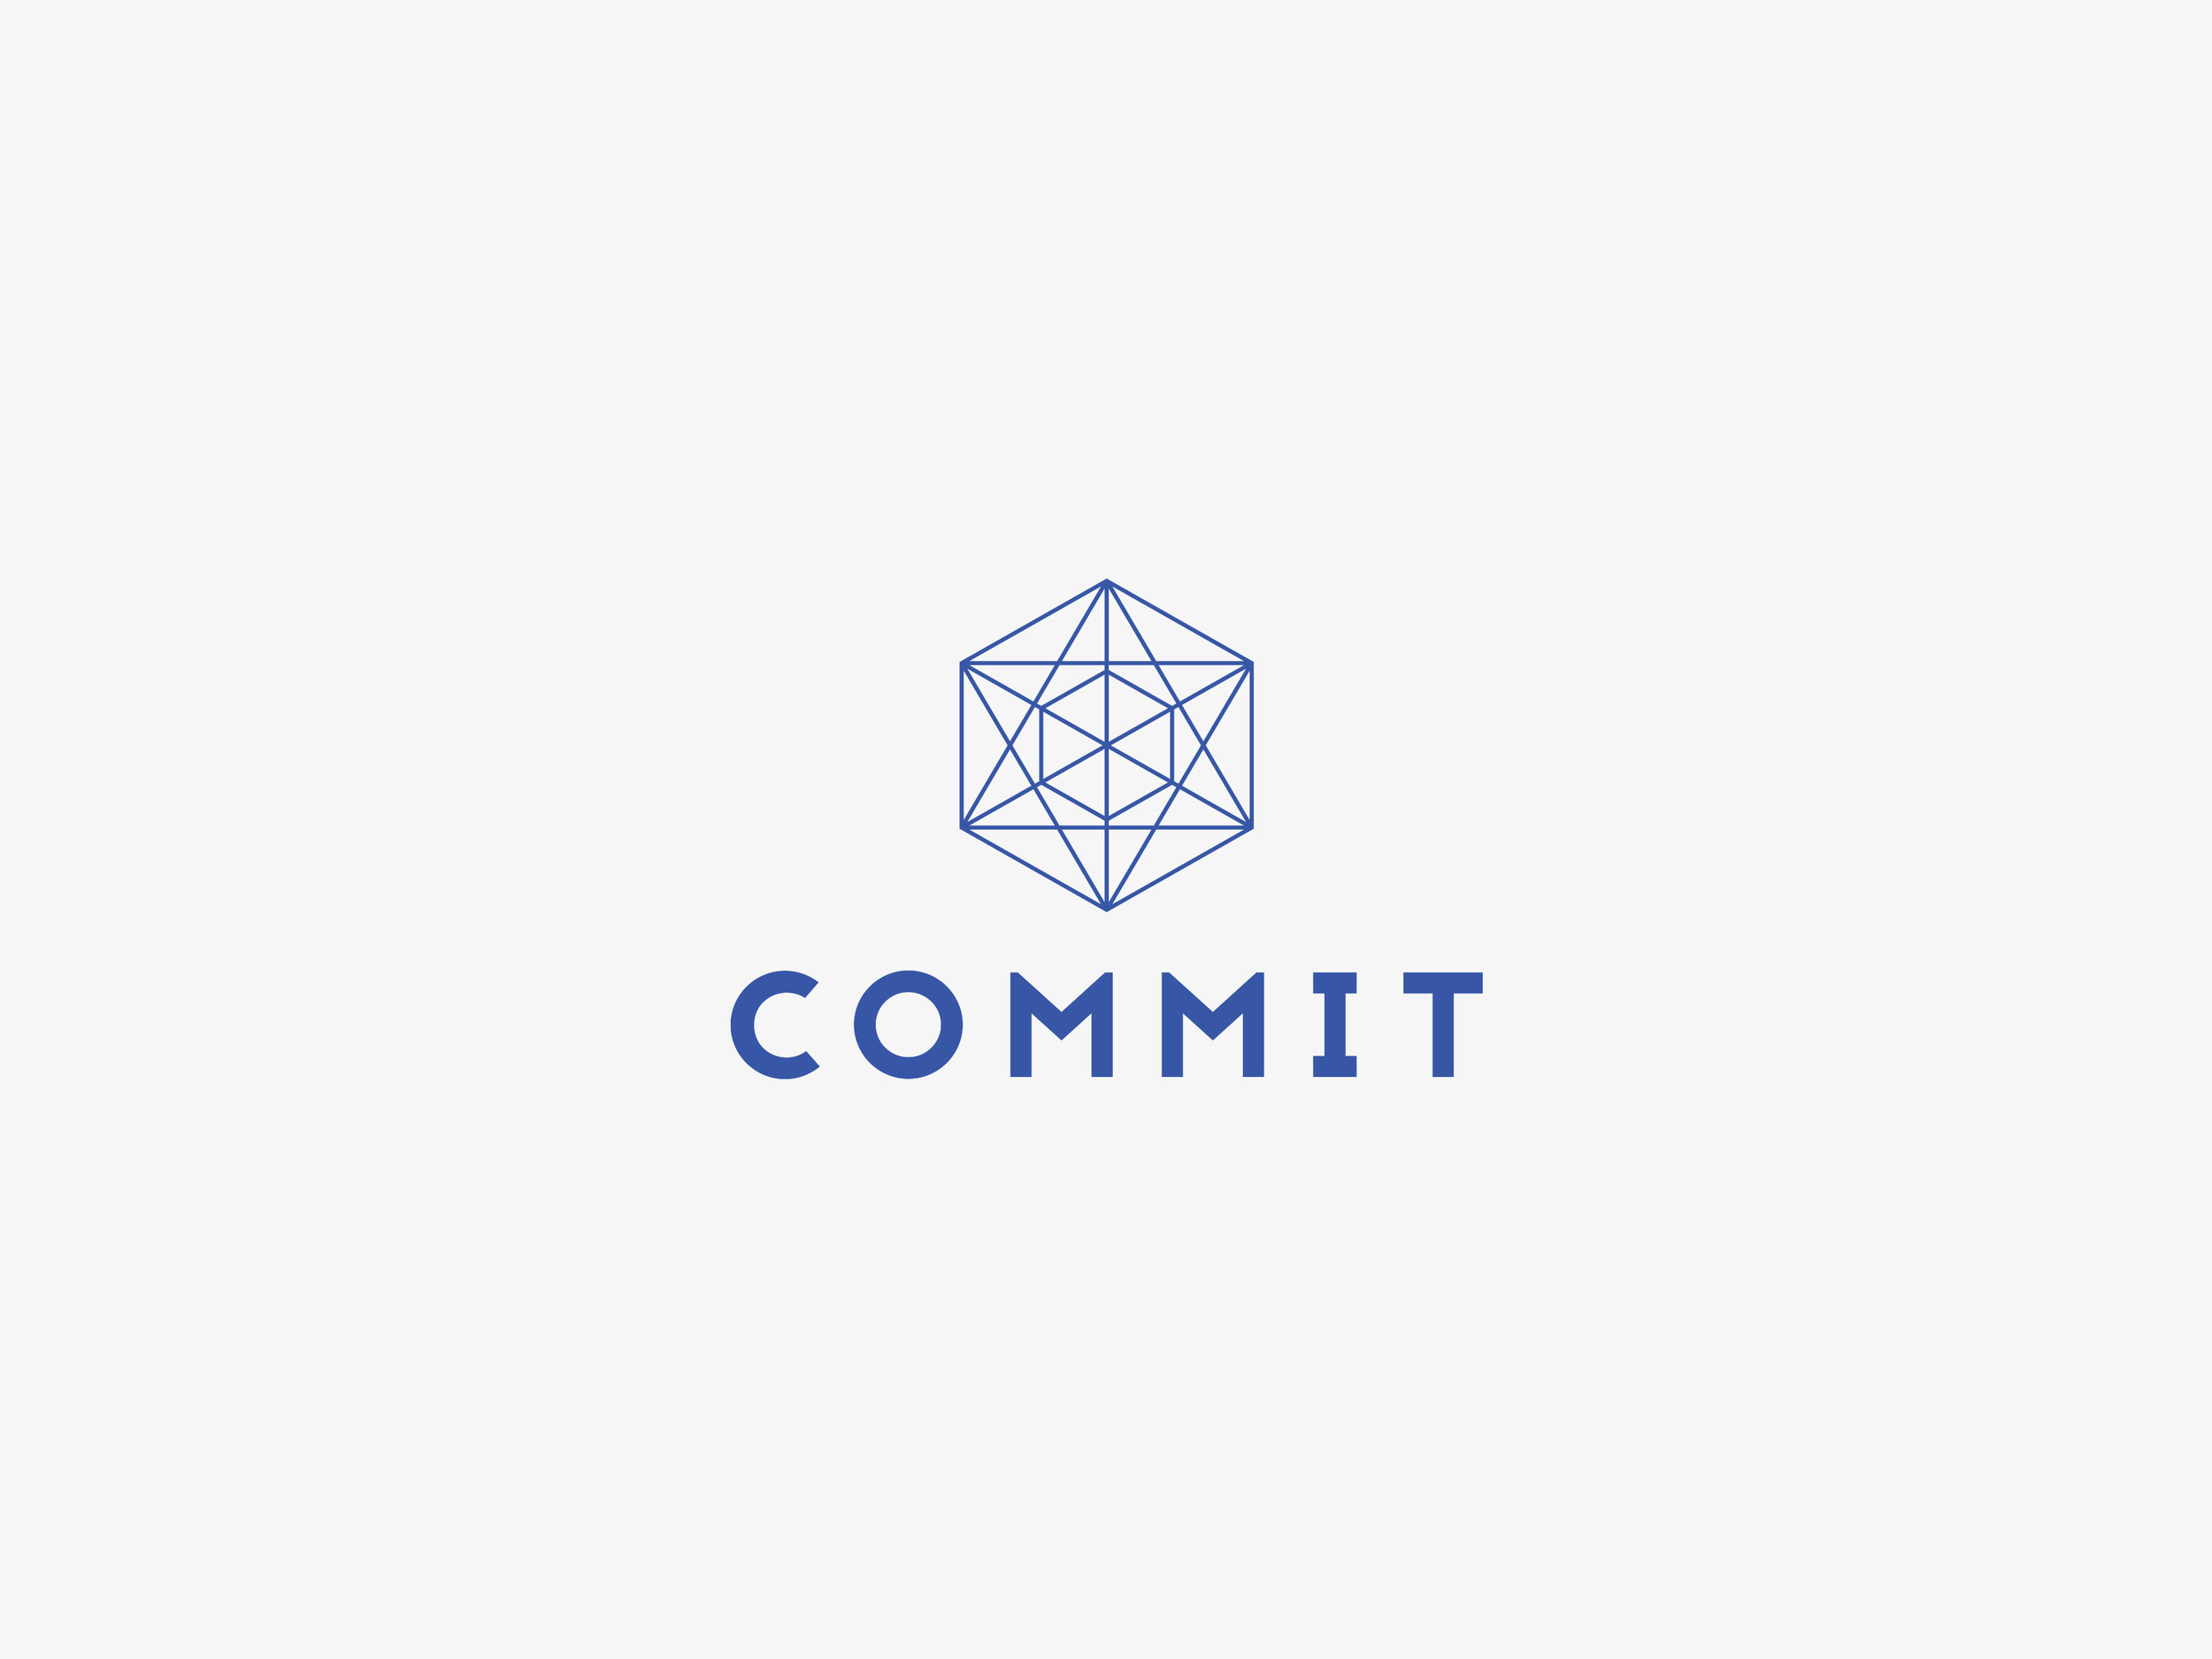 Studio_Bloq-Commit_Skate_Co-2.jpg